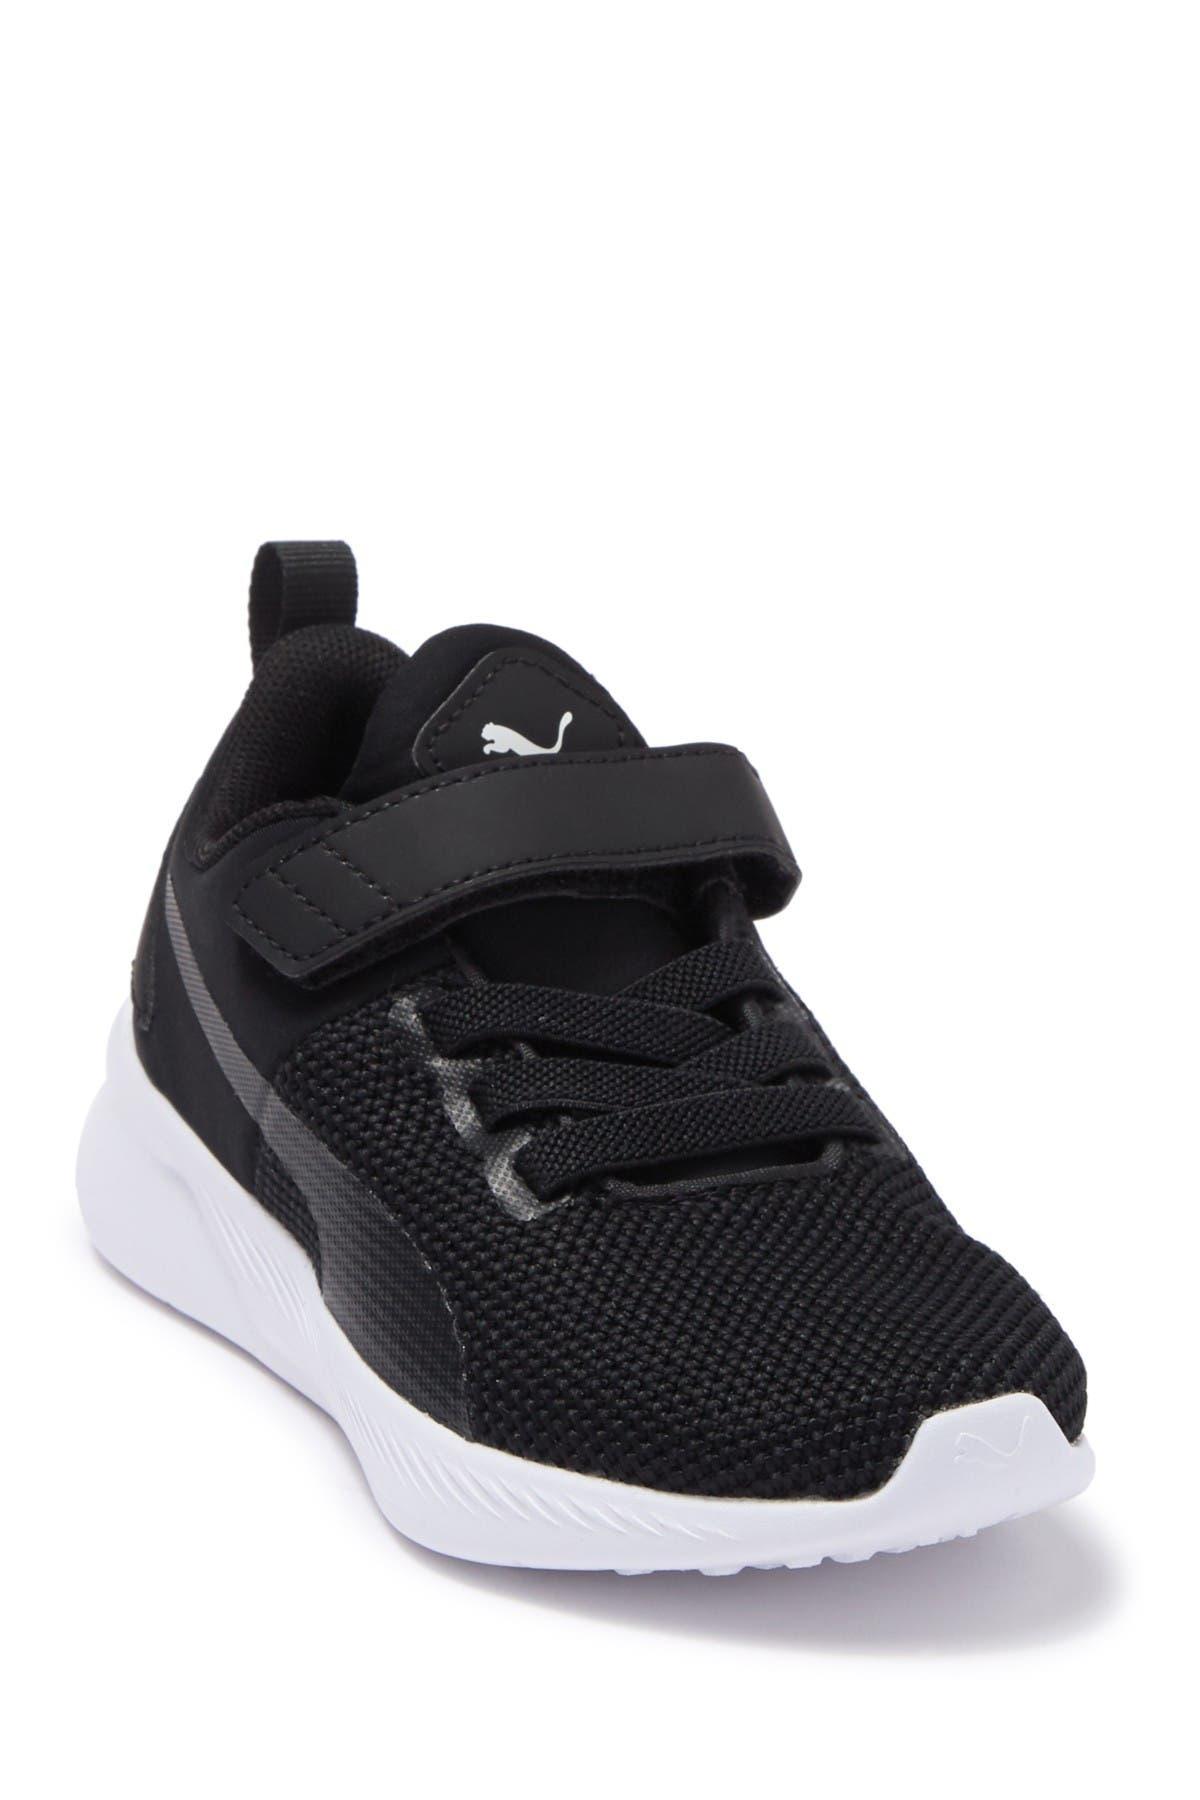 Image of PUMA Flyer Runner V PS Sneaker